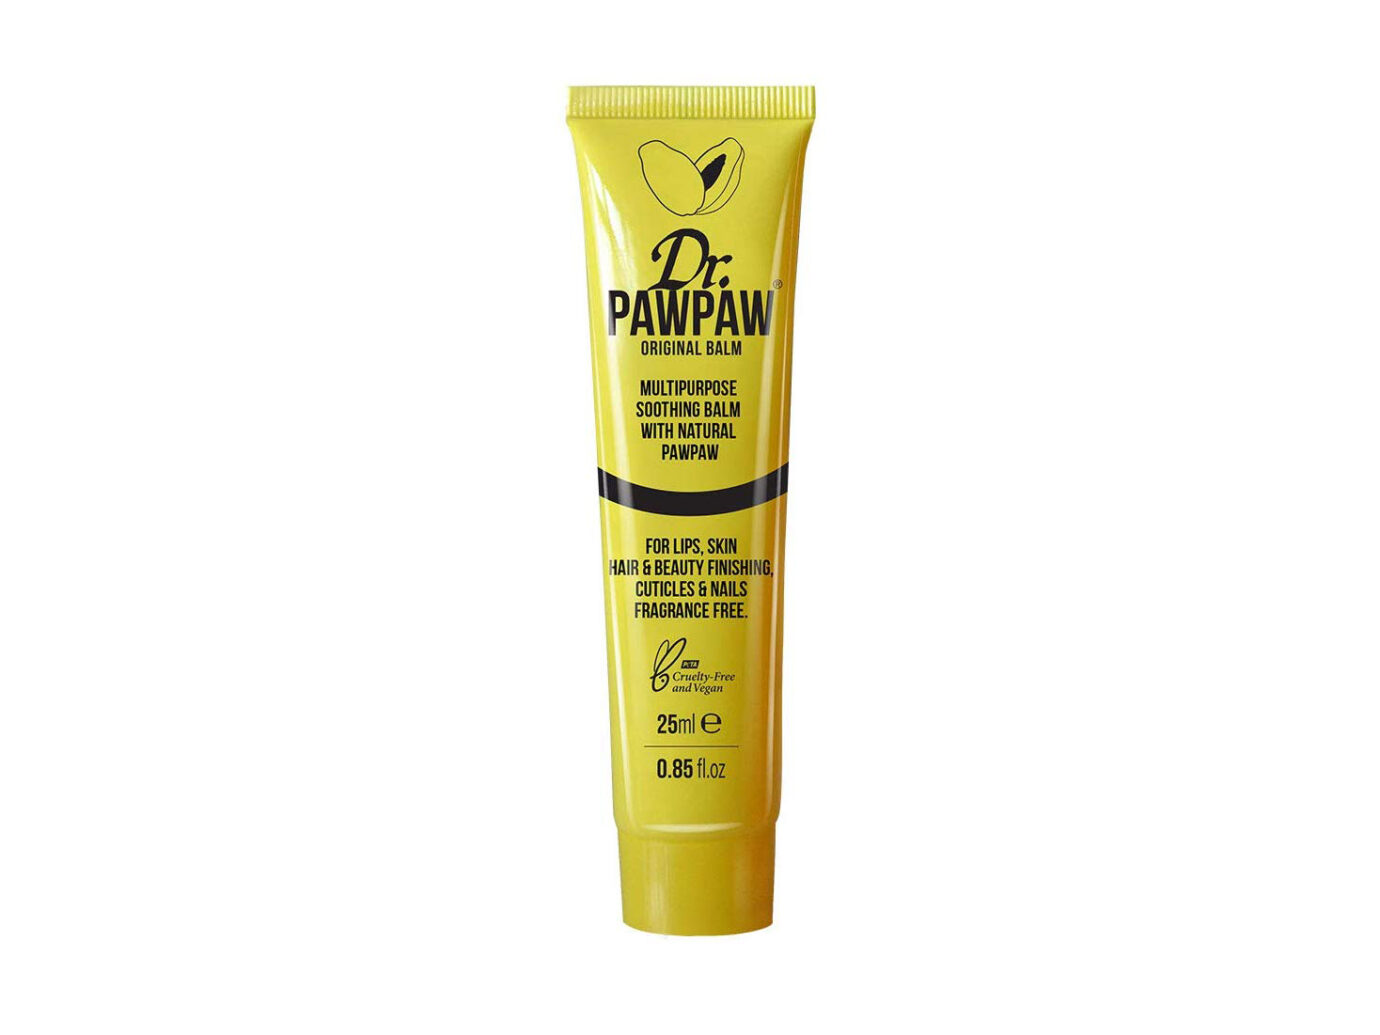 Dr. Pawpaw Multi-Purpose Balm